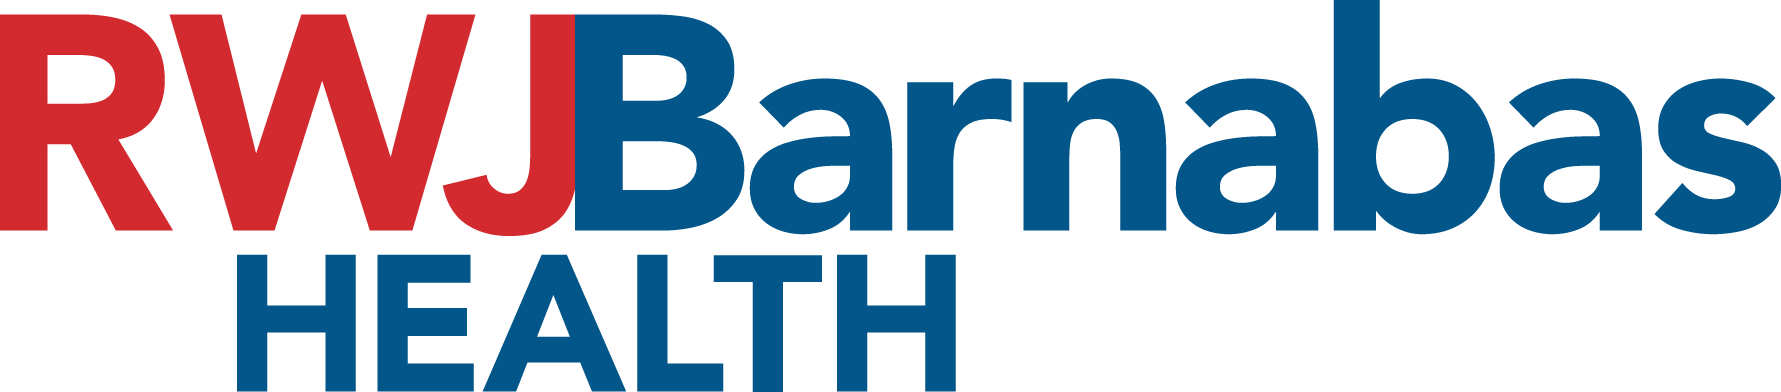 RWJ Barnabas Logo